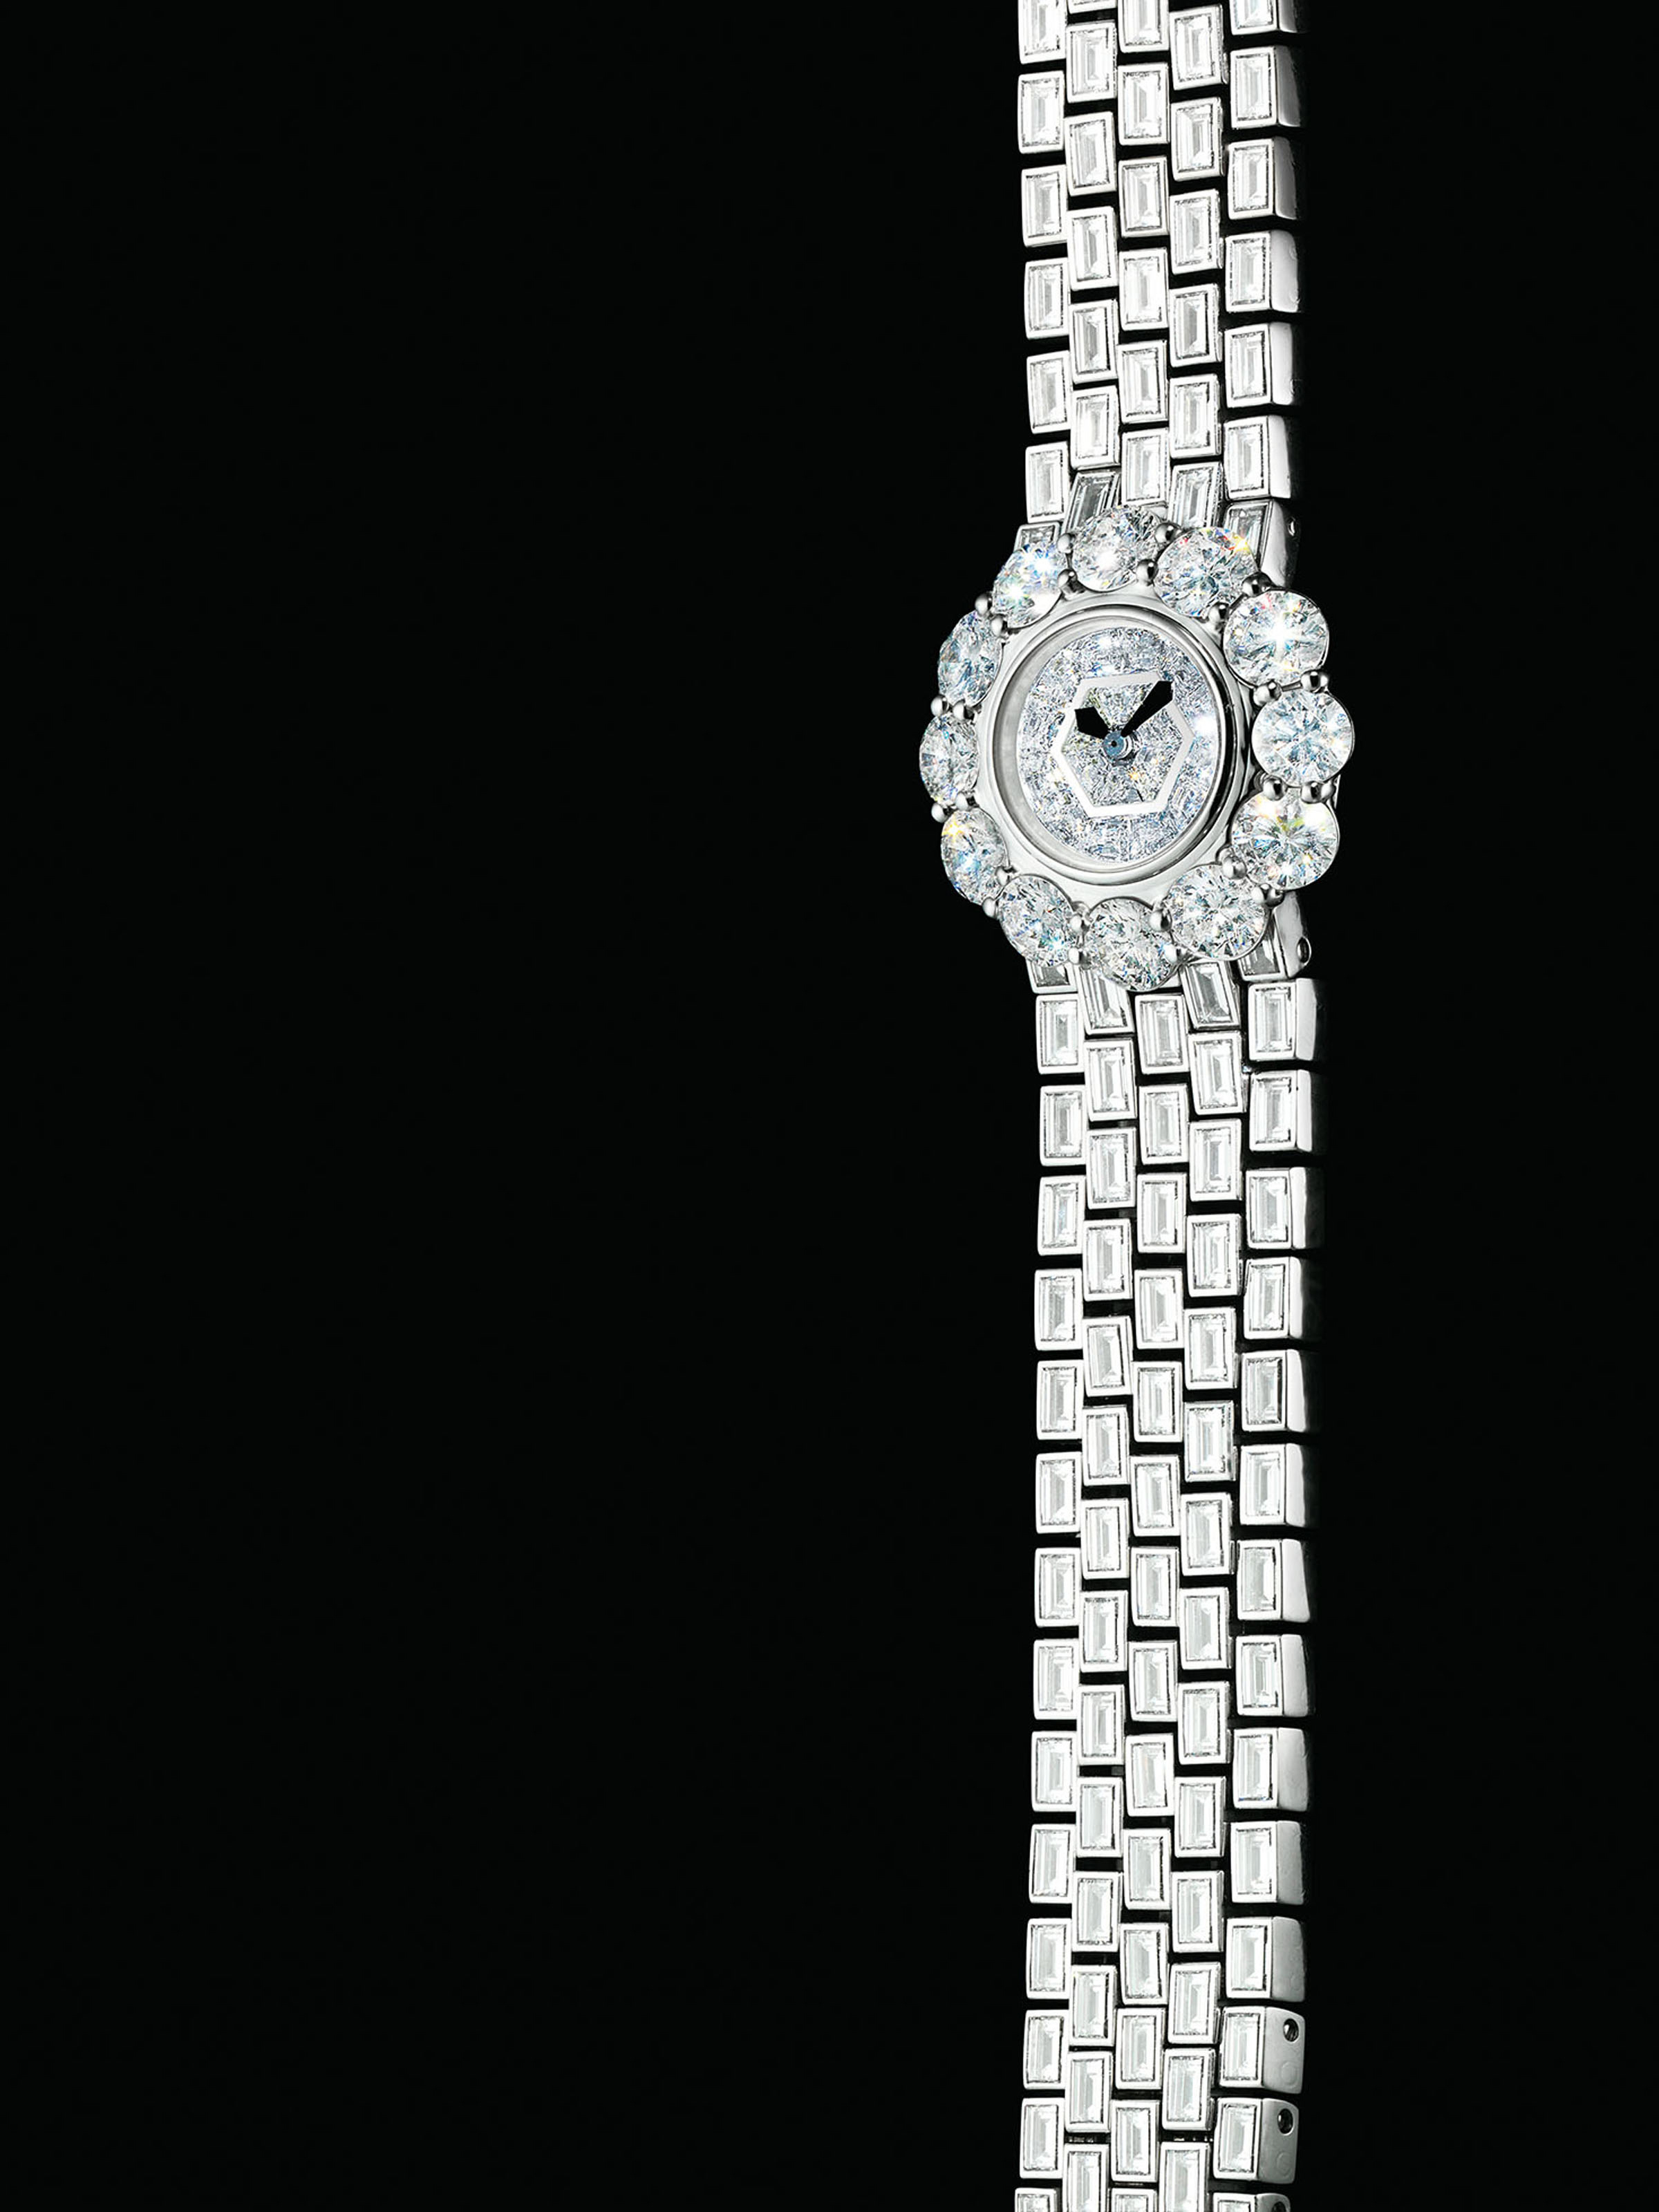 GERALD GENTA. A LADY'S FINE AND RARE 18K WHITE GOLD AND DIAMOND-SET BRACELET WATCH